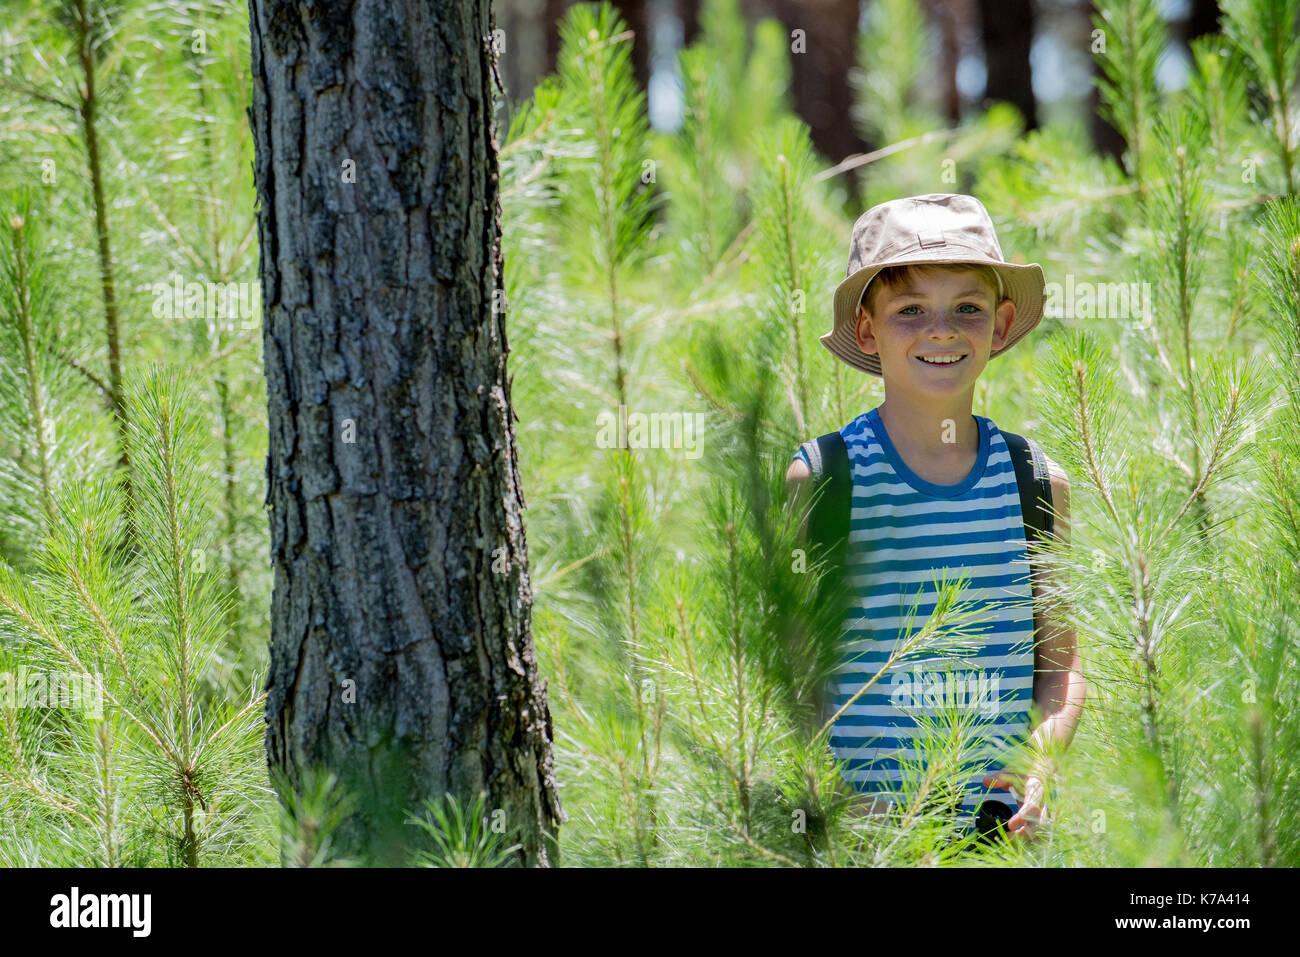 Boy hiking in woods, portrait - Stock Image